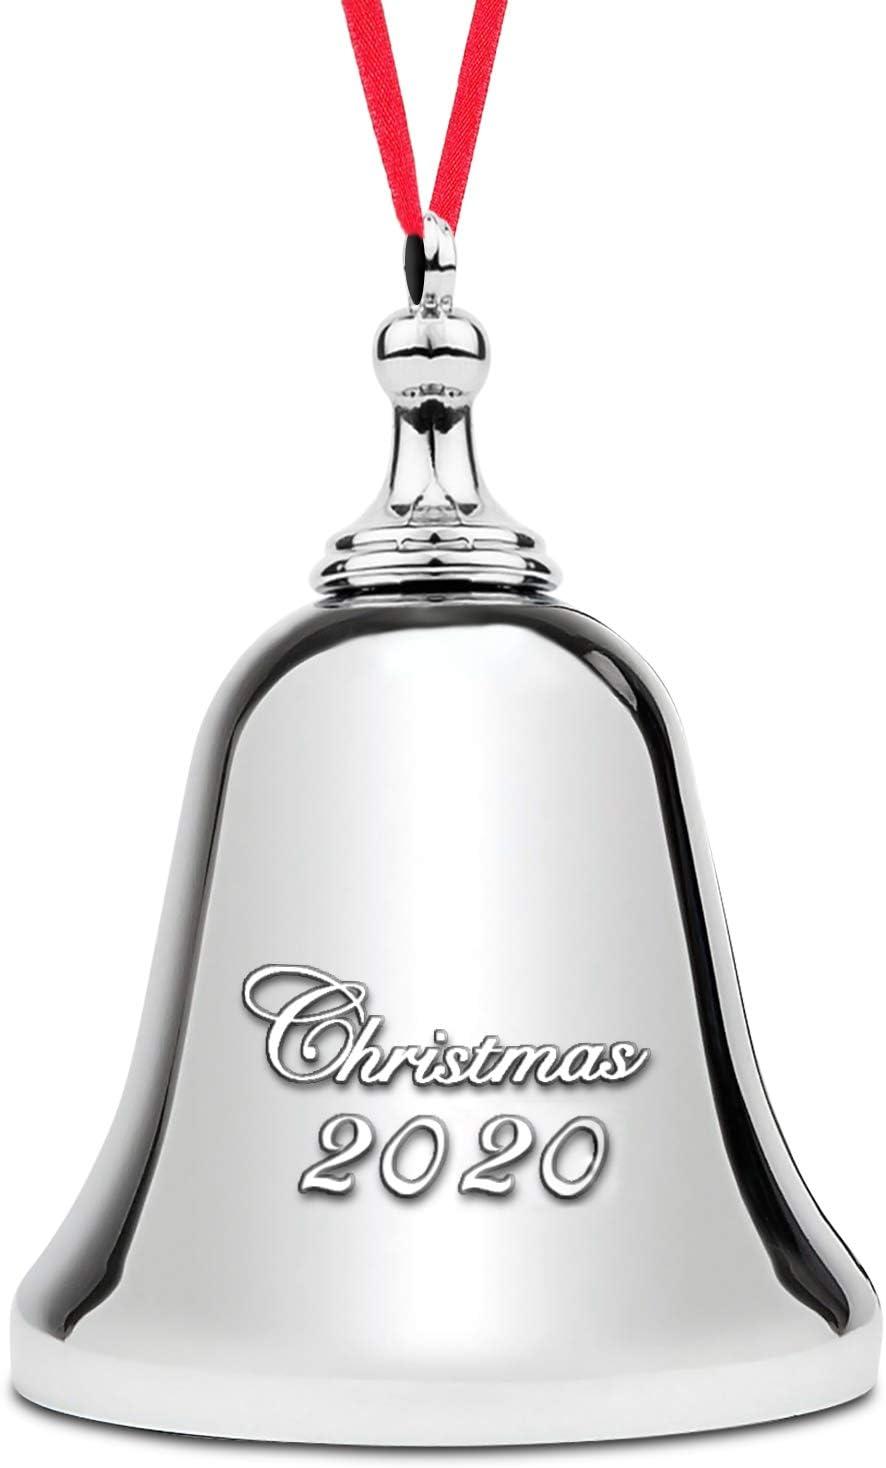 2020 Jingle Bell Ornament – Elegant Christmas Bell Ornament